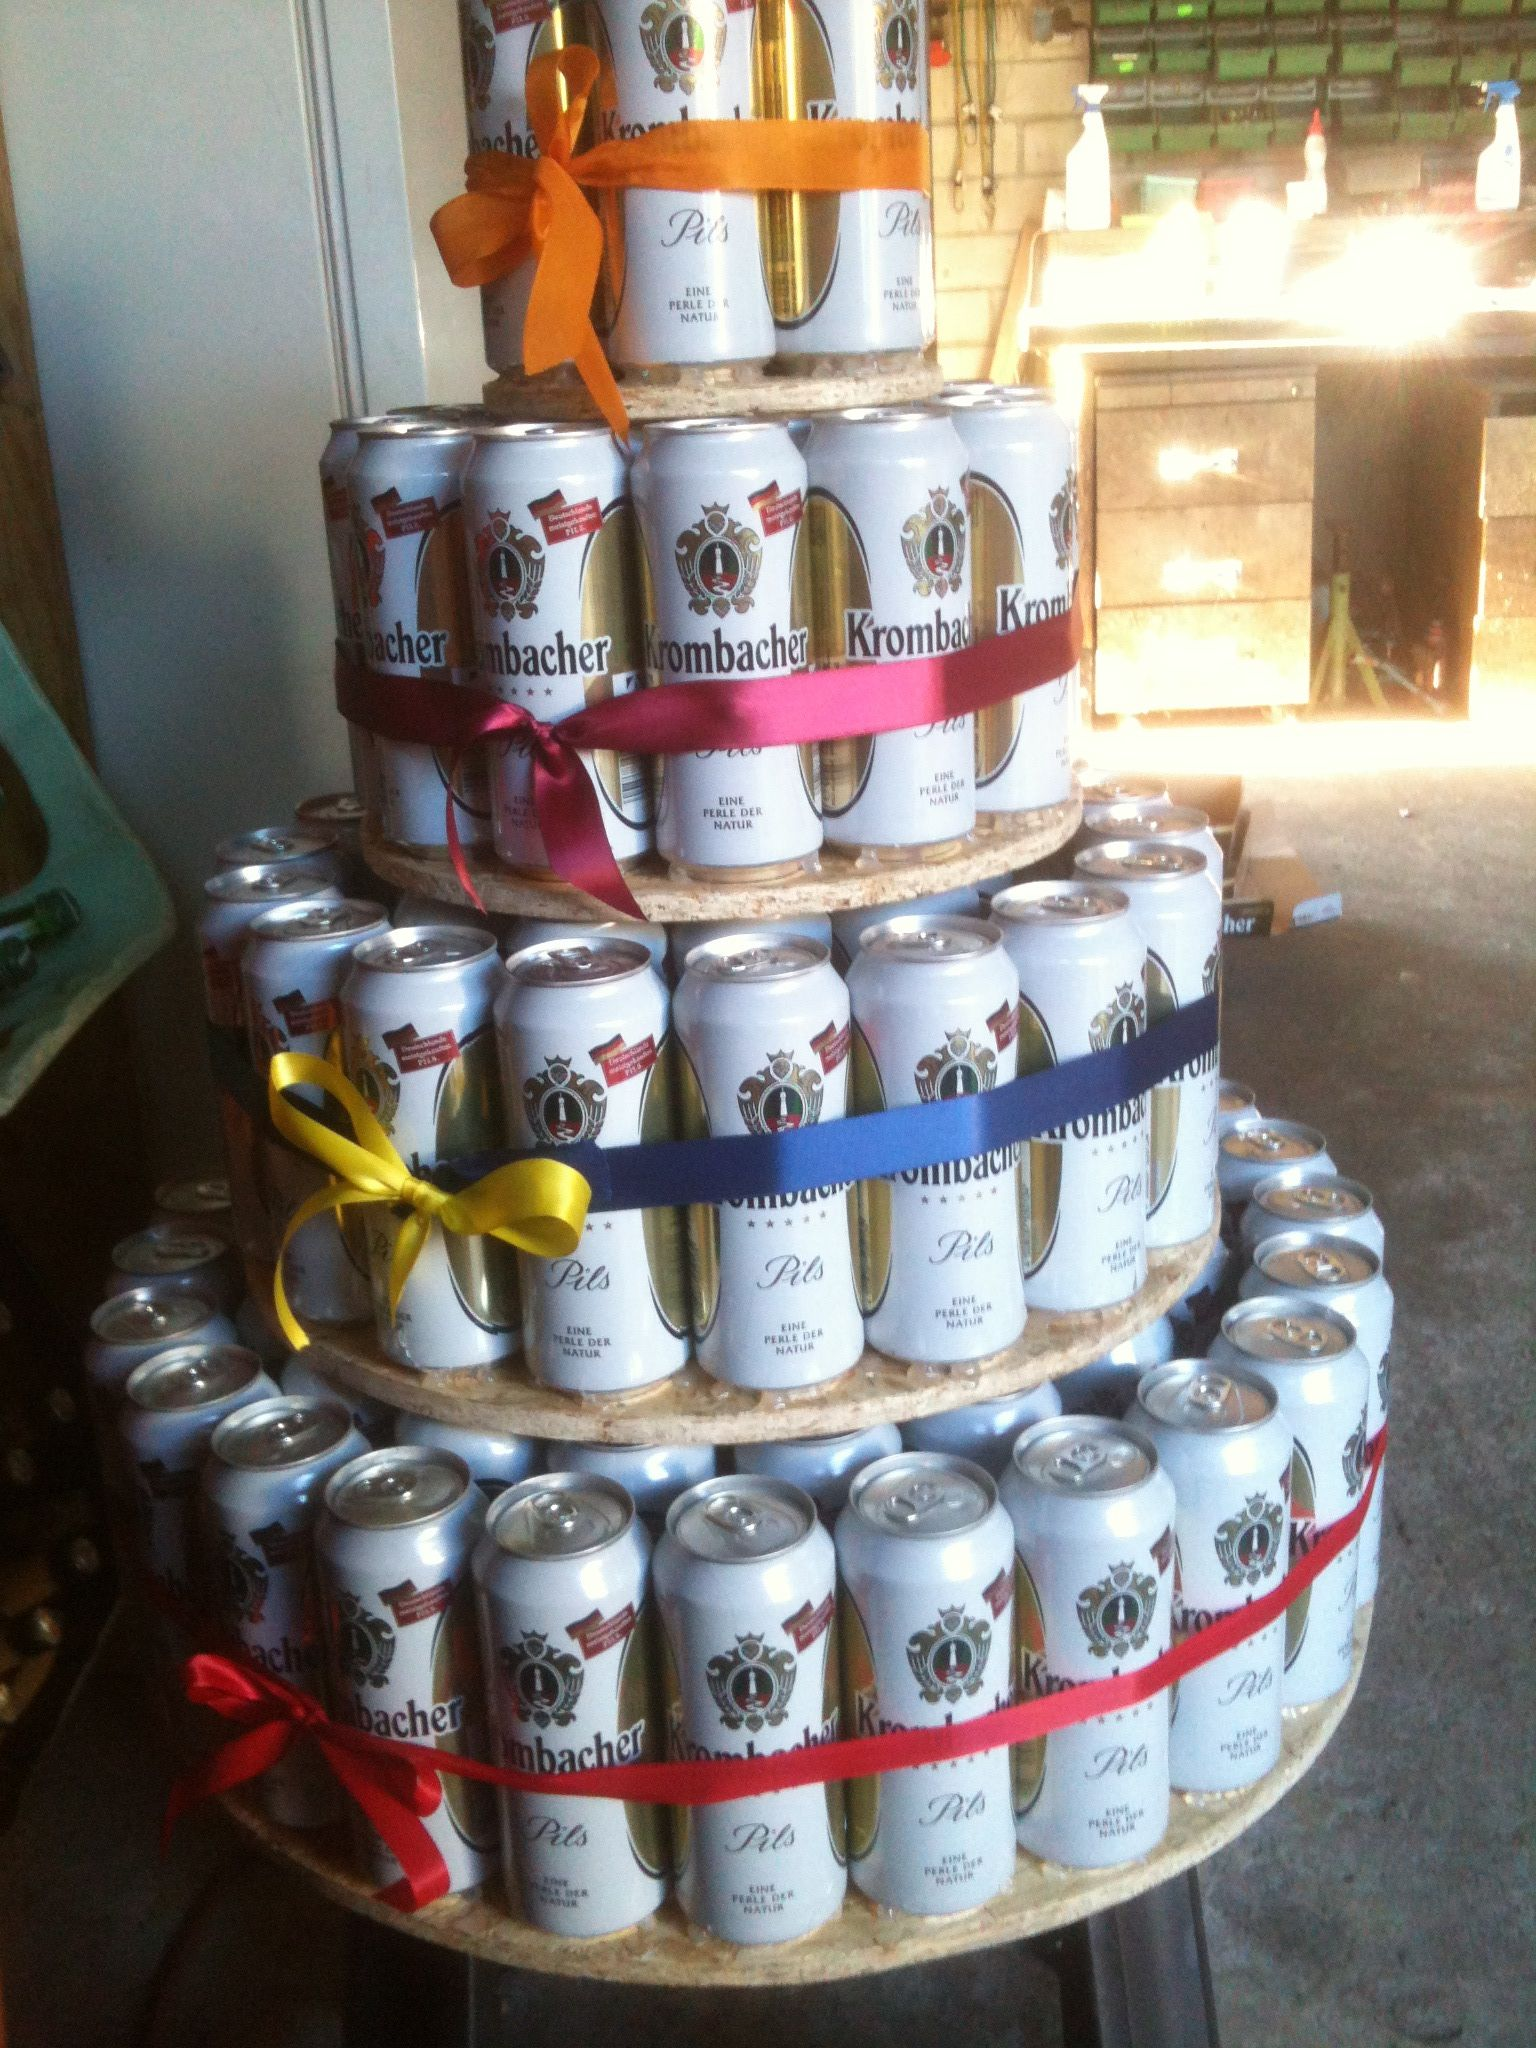 bierdosen torte 5 paletten beer can cake 5 pallets of cans geschenke pinterest. Black Bedroom Furniture Sets. Home Design Ideas